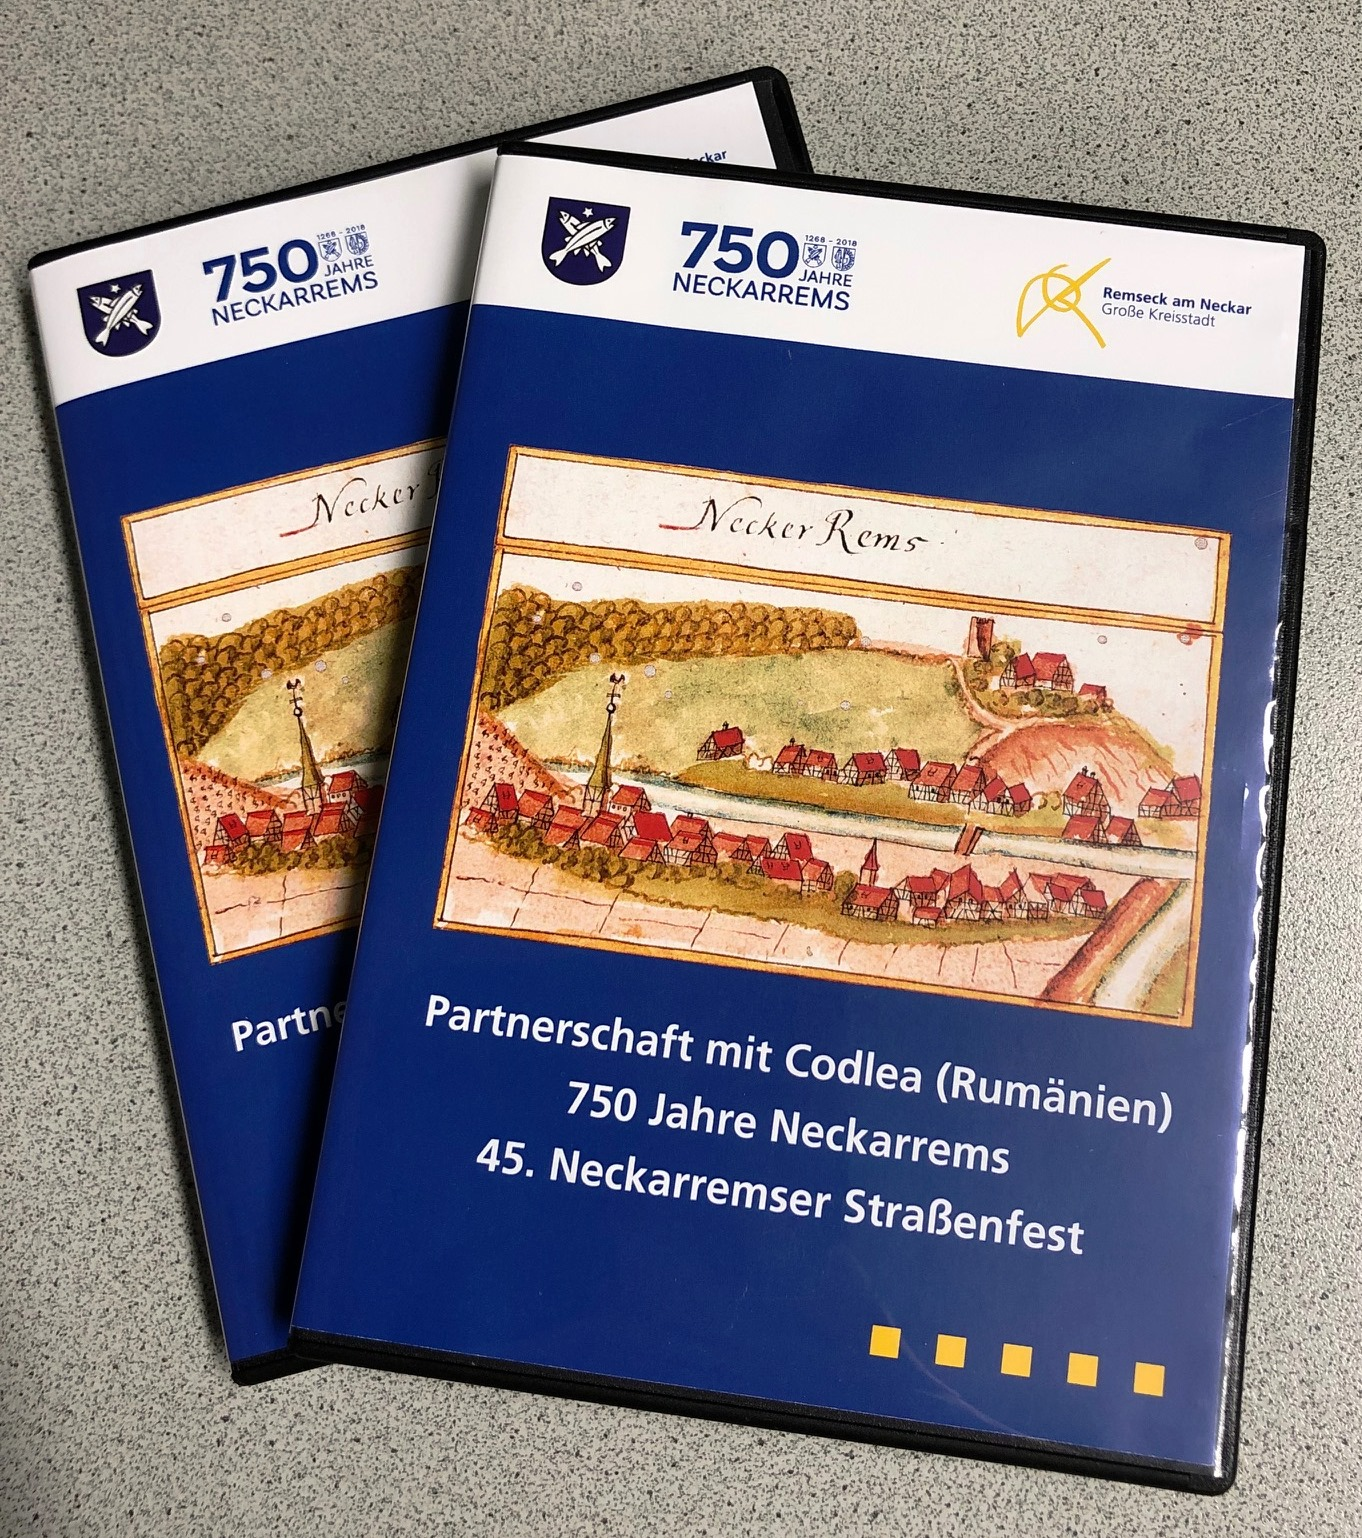 DVD »750 Jahre Neckarrems« | Stadt Remseck am Neckar